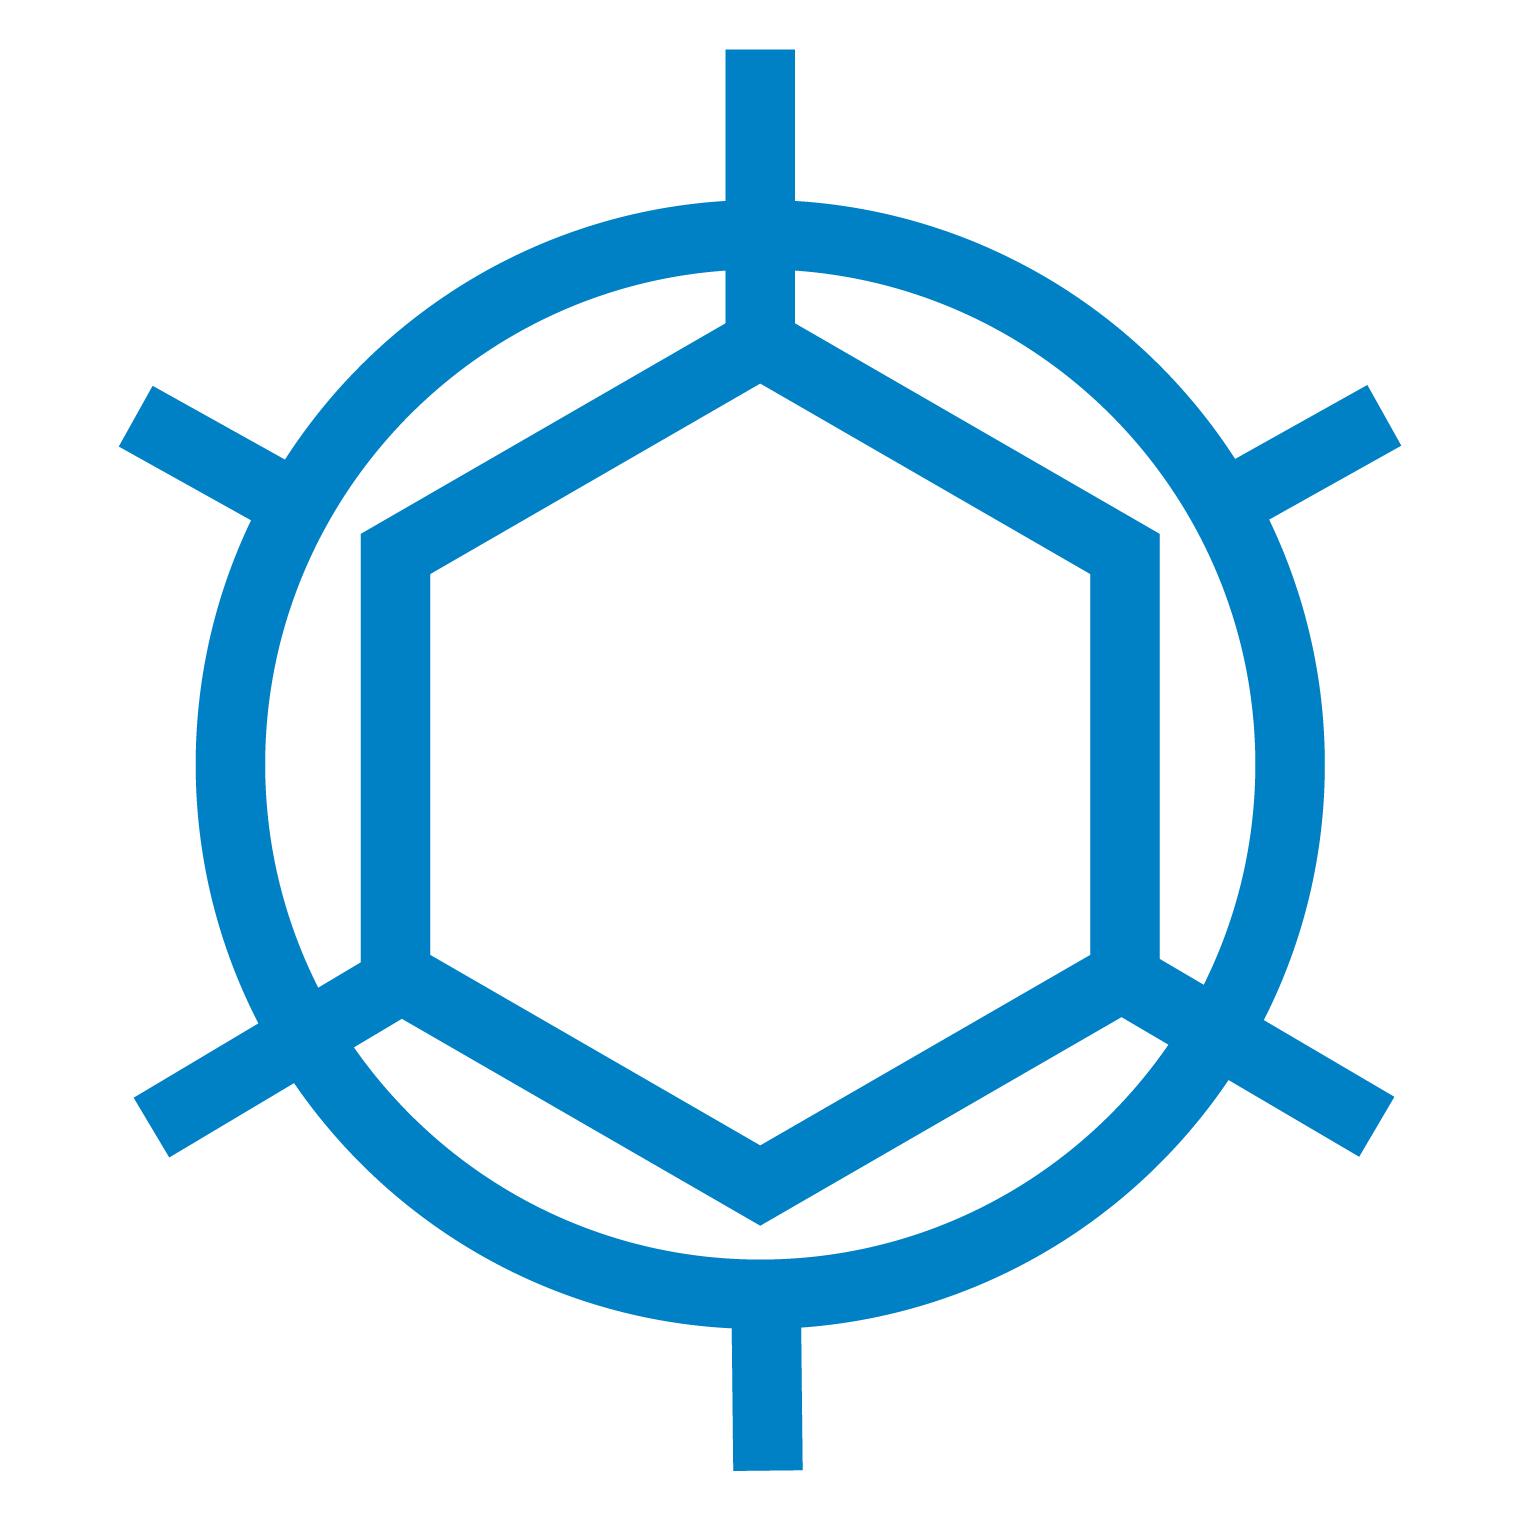 Blue Virus Icon